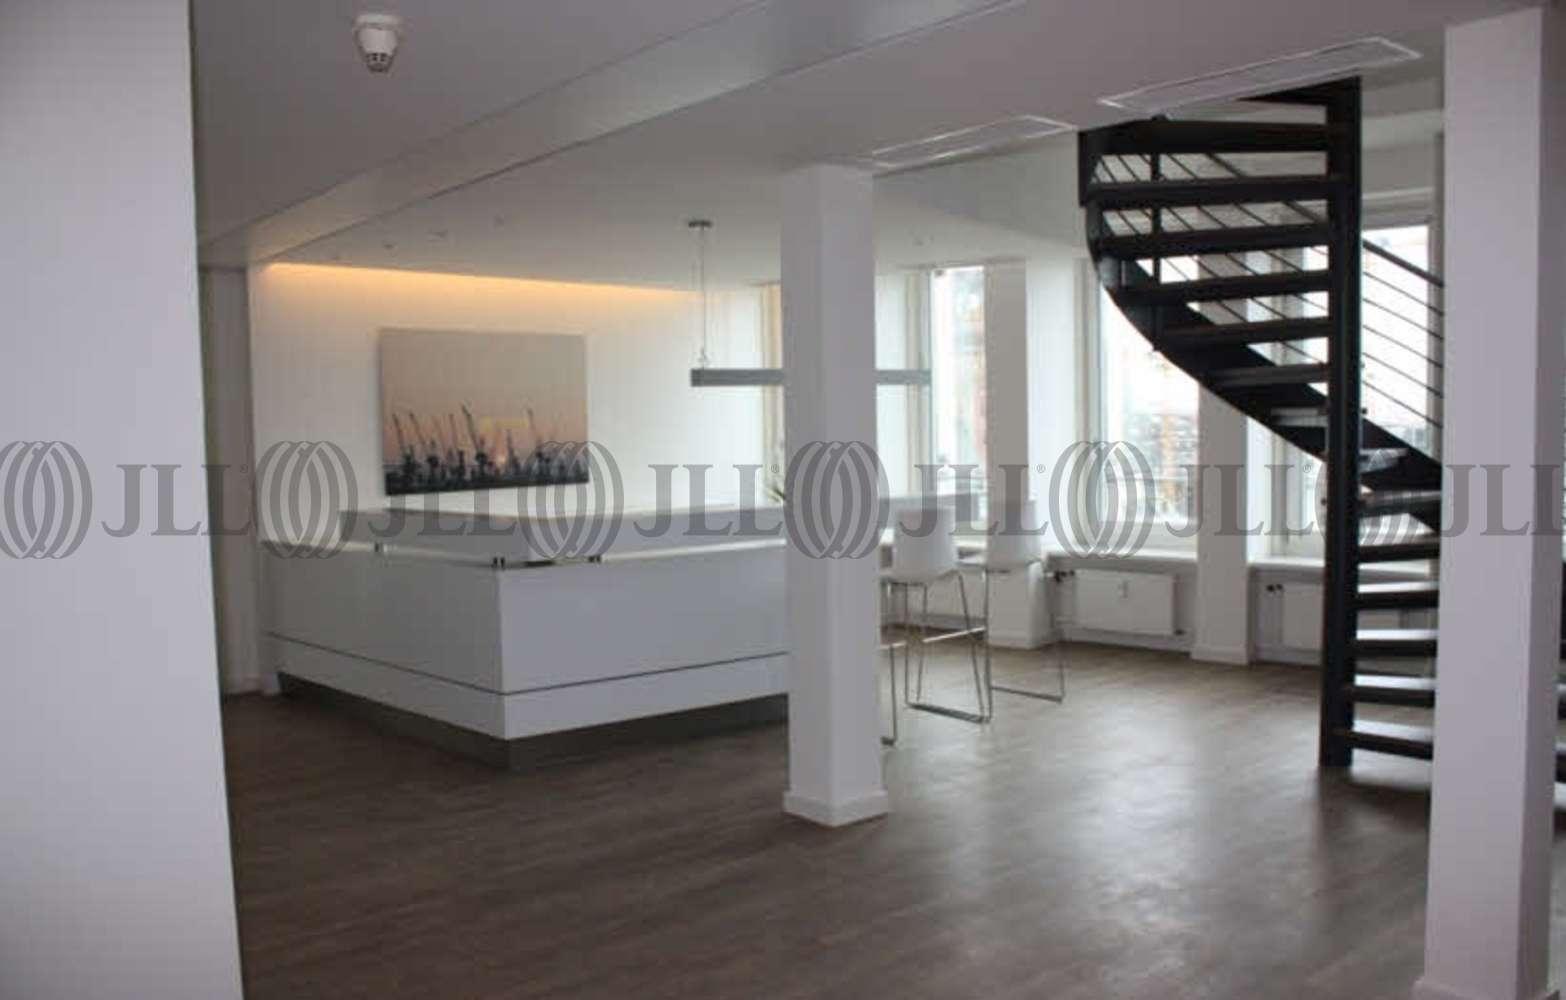 Büros Hamburg, 20457 - Büro - Hamburg, Altstadt - H0329 - 9400242